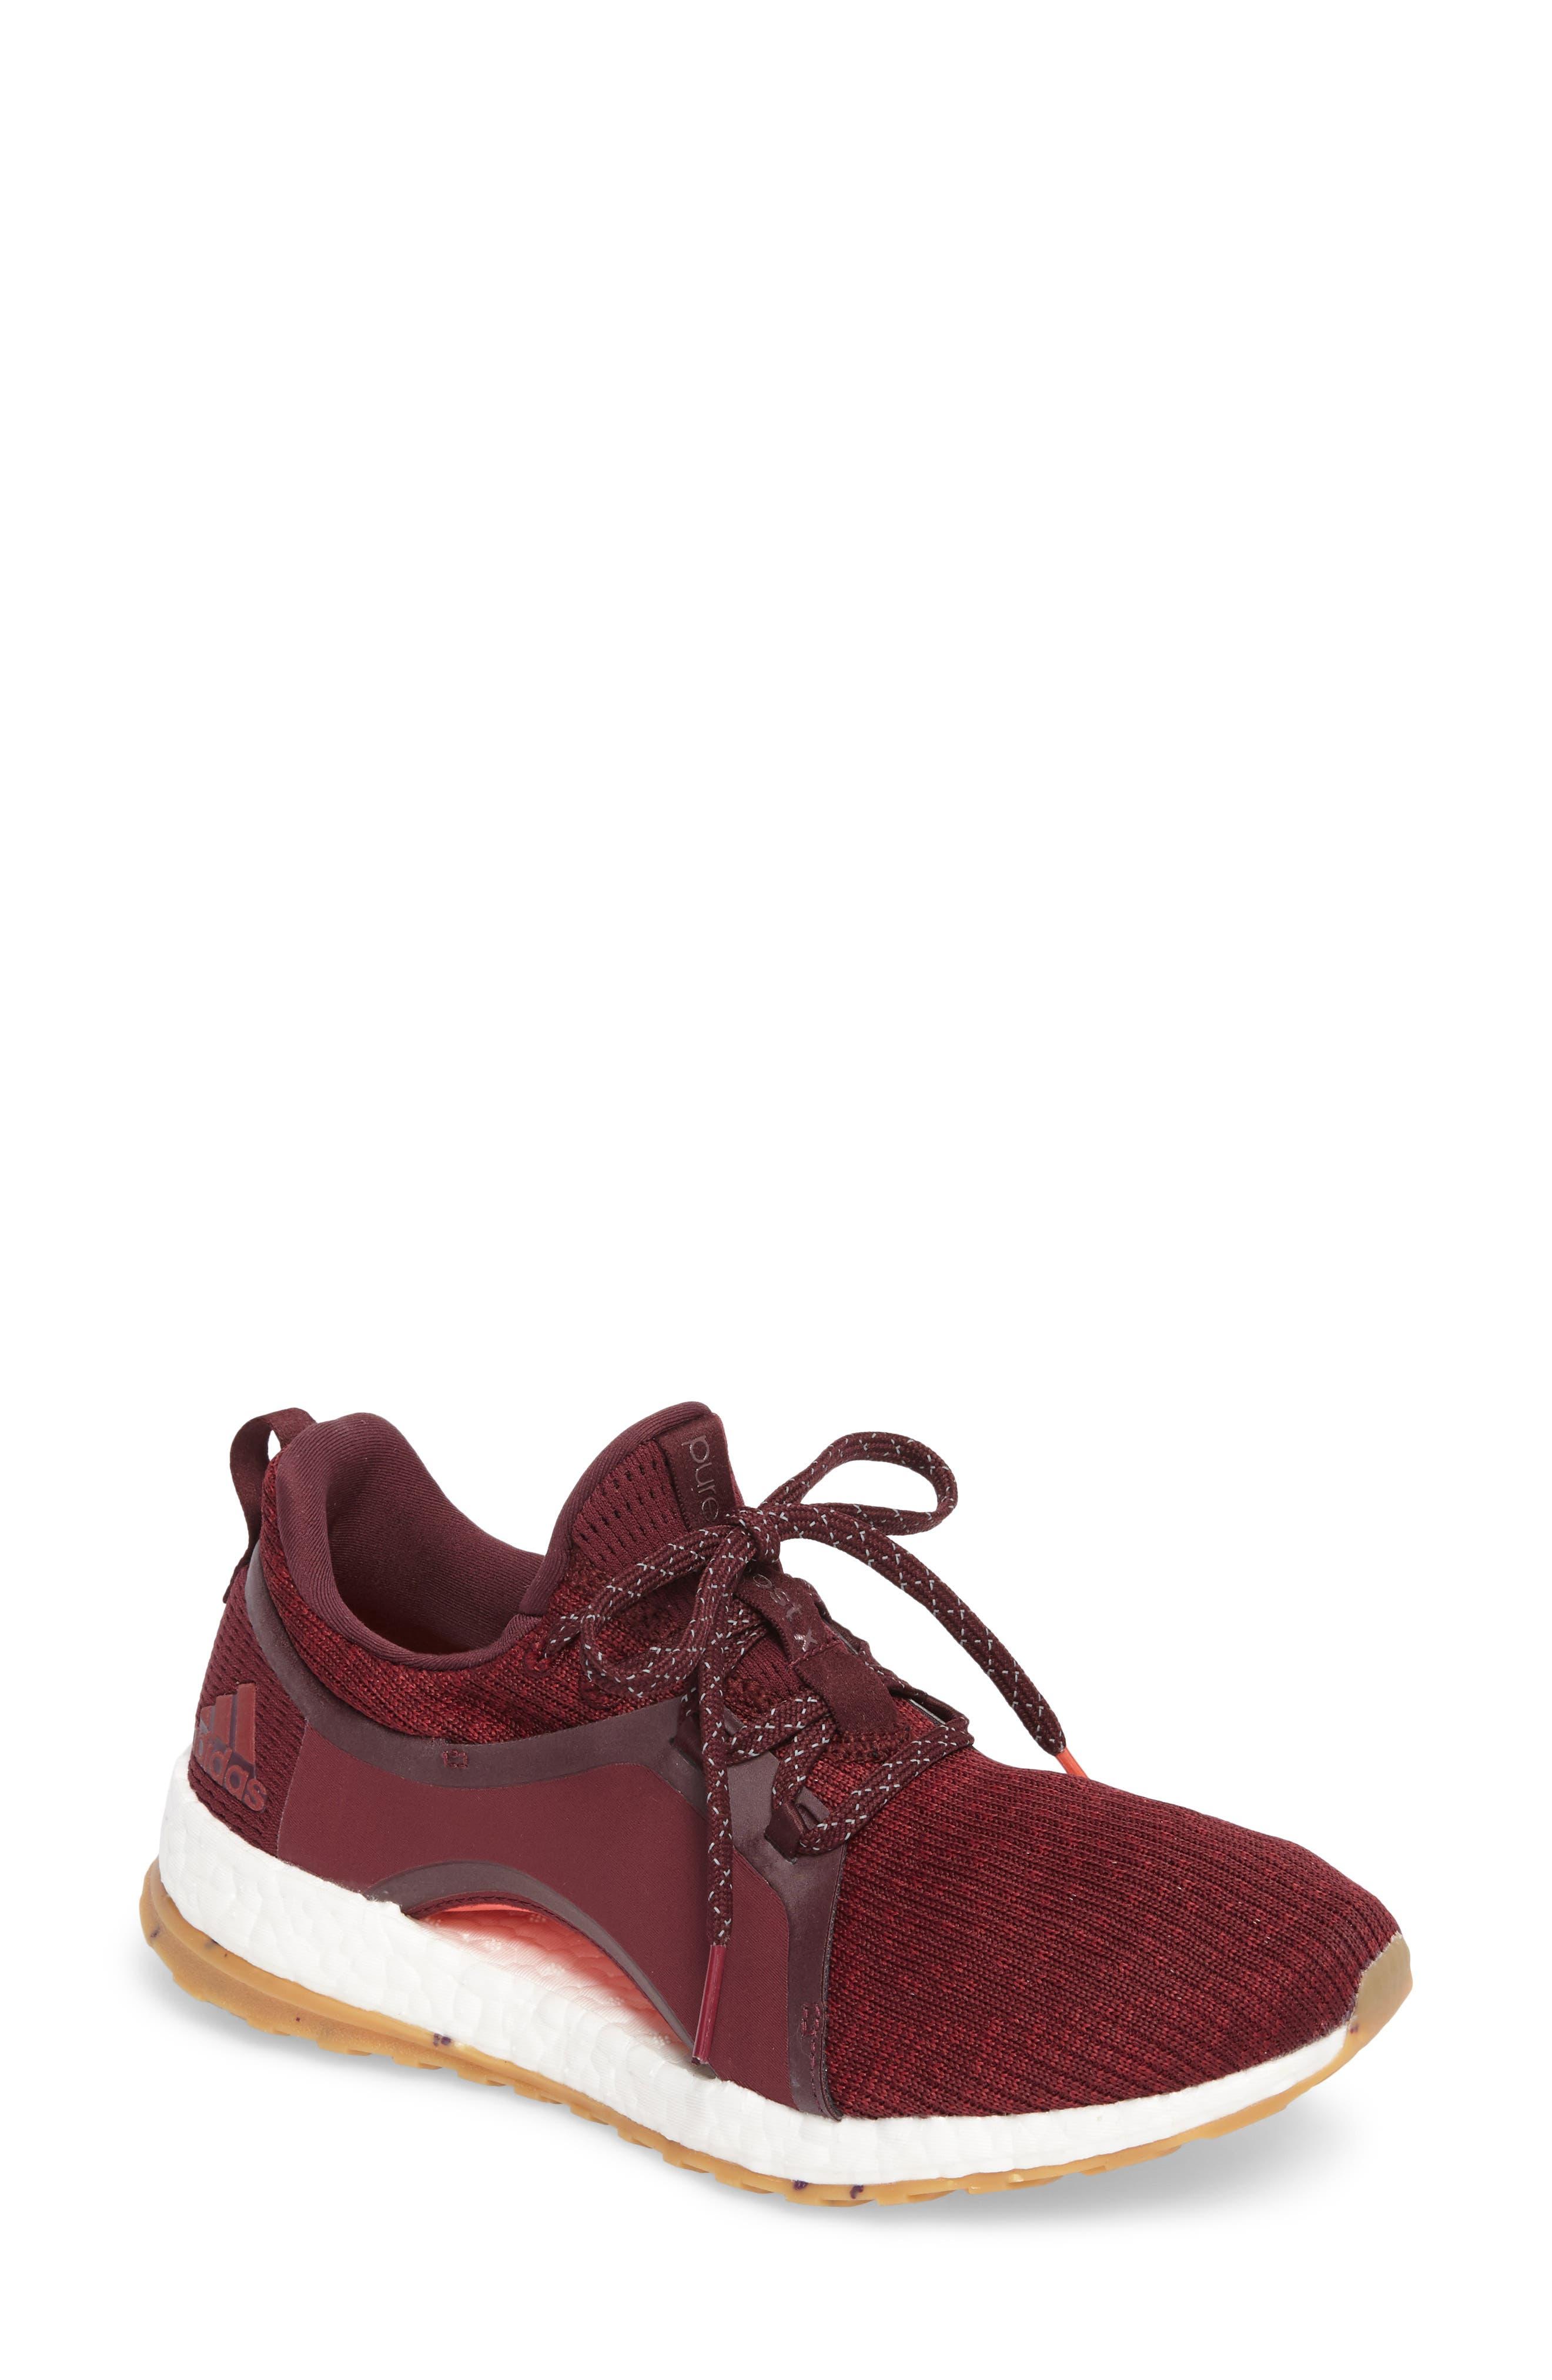 PureBoost X ATR Running Shoe,                             Main thumbnail 2, color,